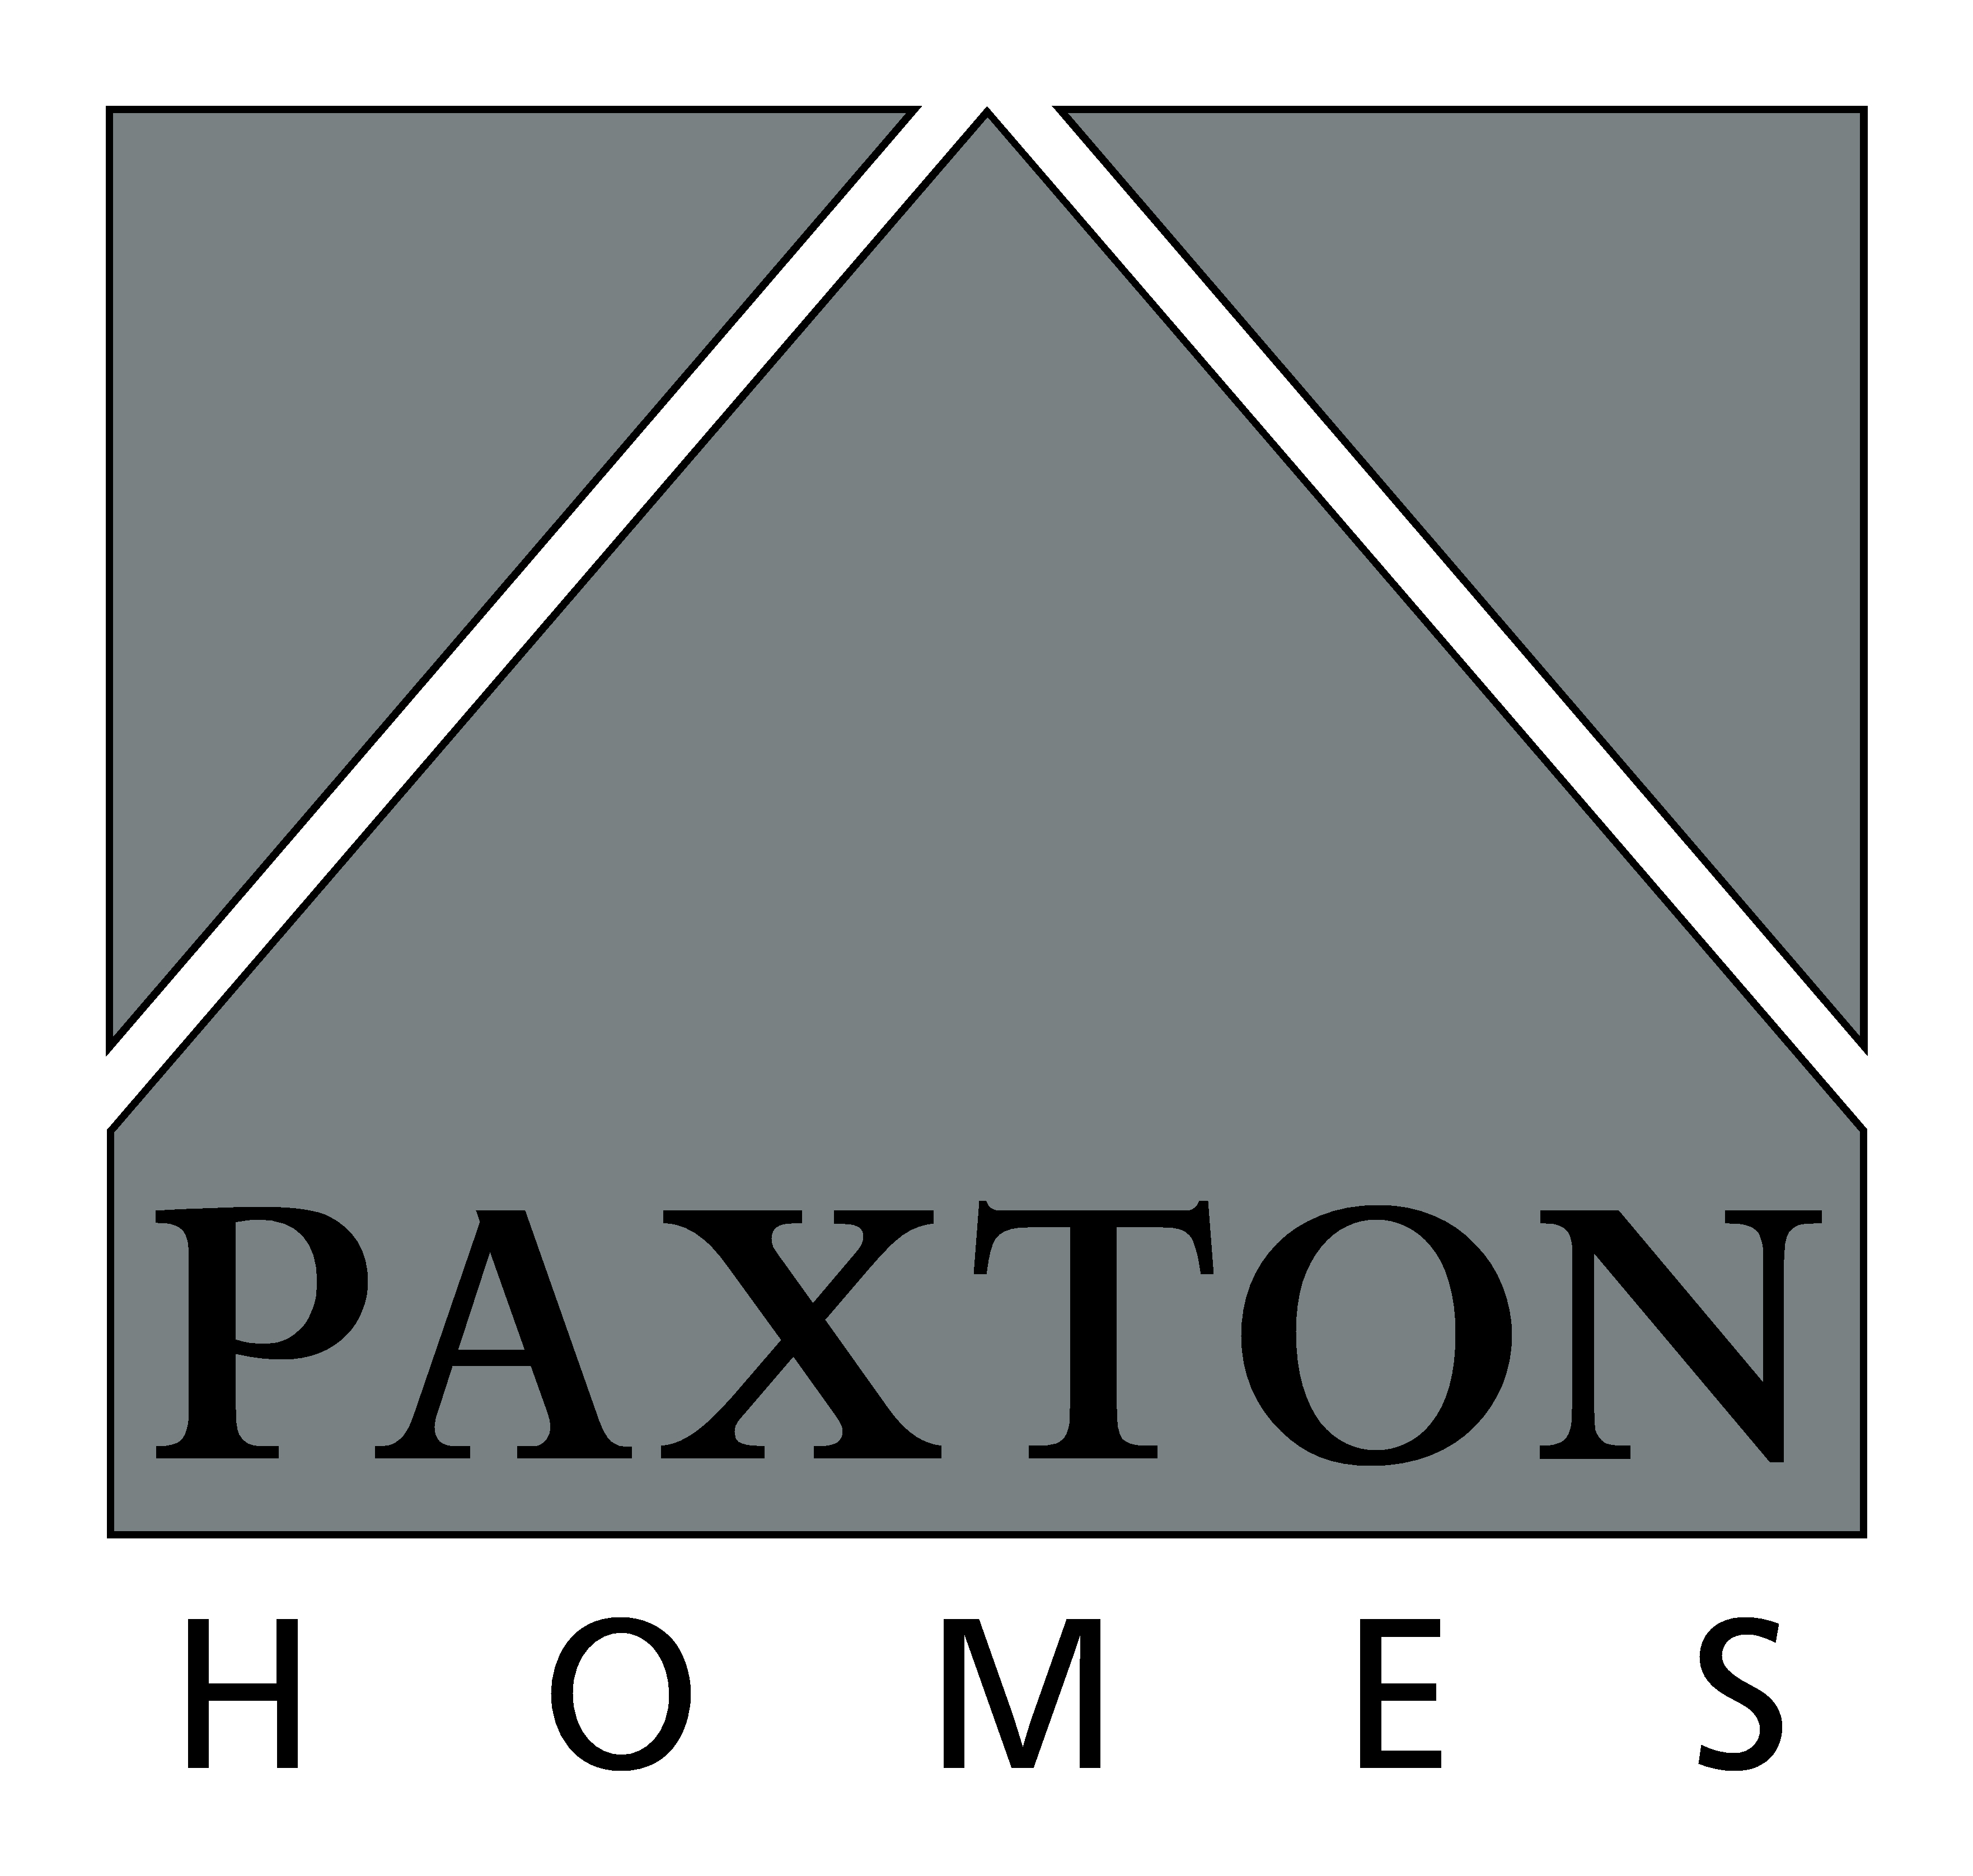 Paxton Homes